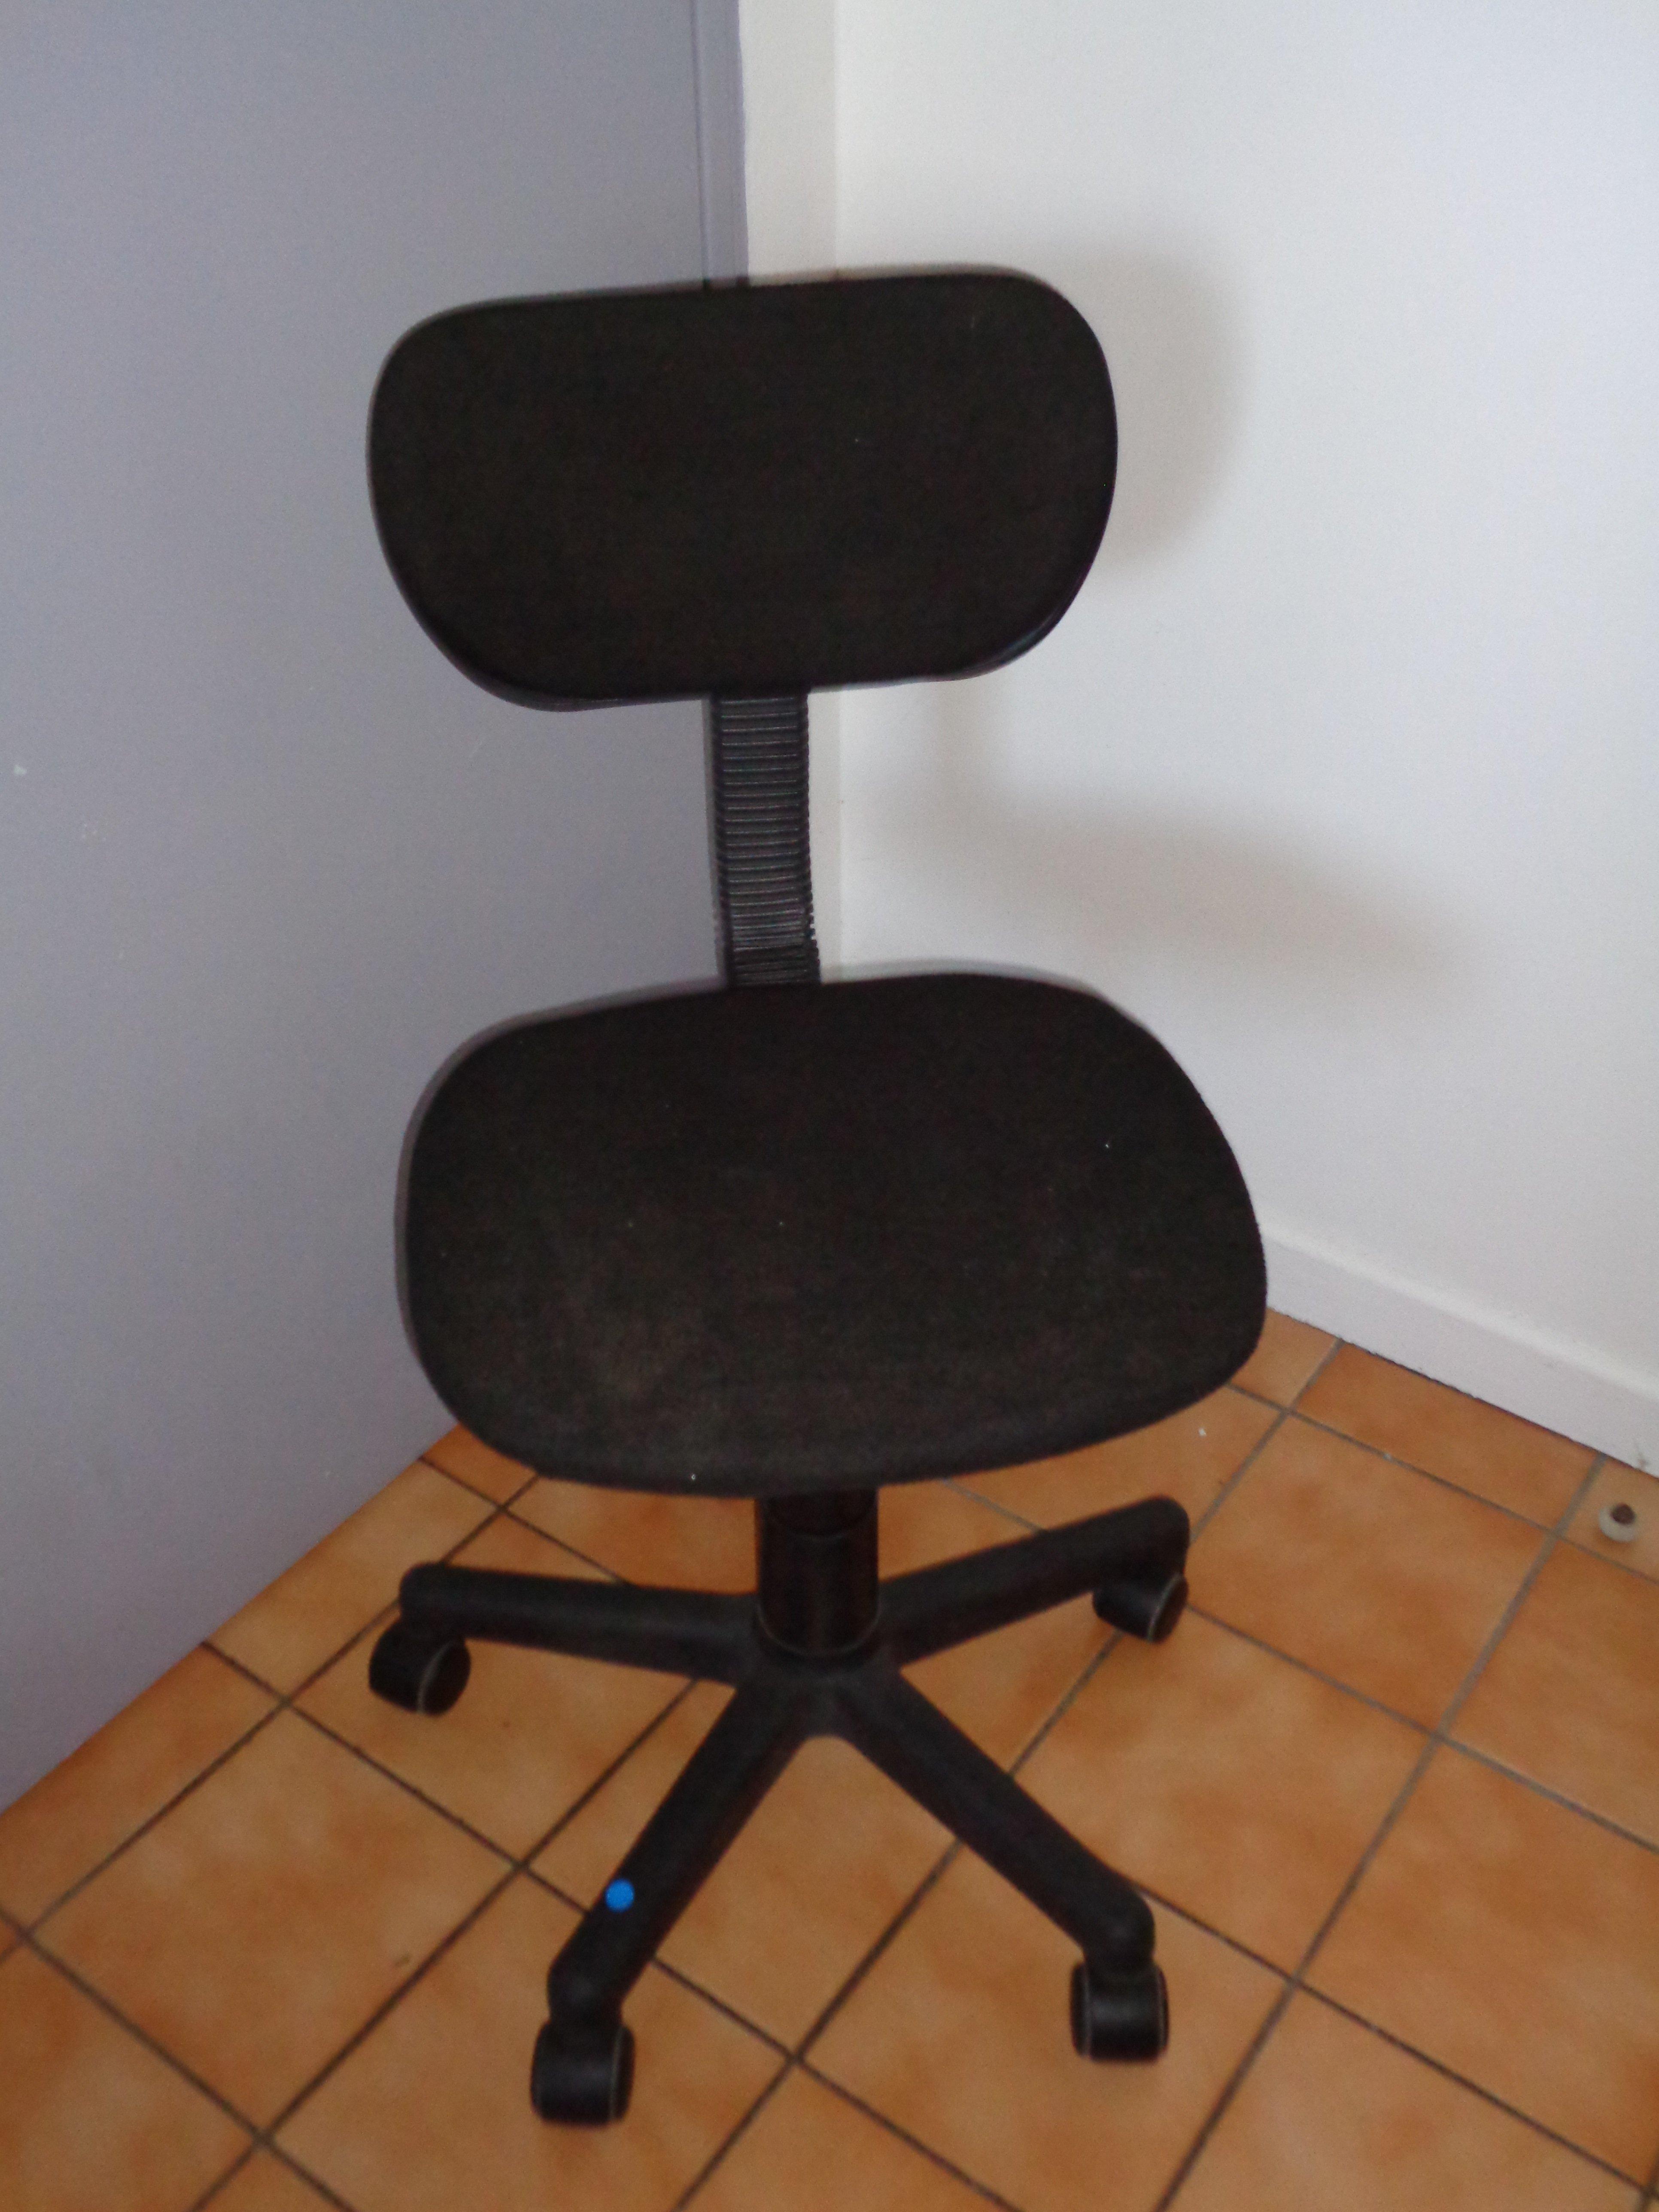 A vendre urgentpourcausededemenagement for Chaise 20 euros